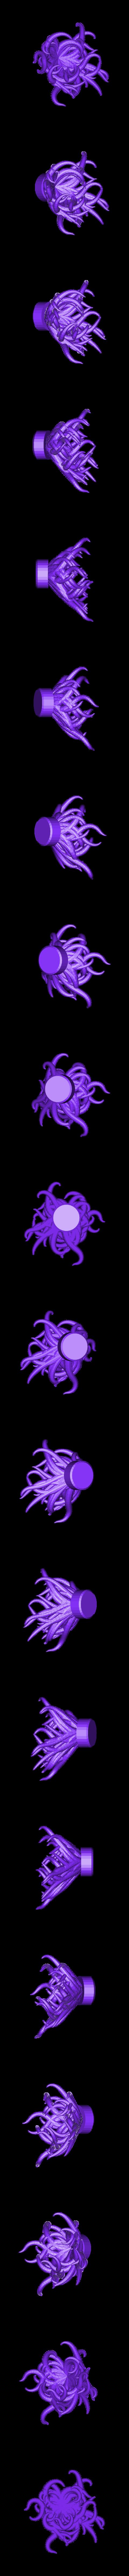 anemone1.stl Download free STL file Plastic Reef #1: Random Anemone Generator • Object to 3D print, ferjerez3d